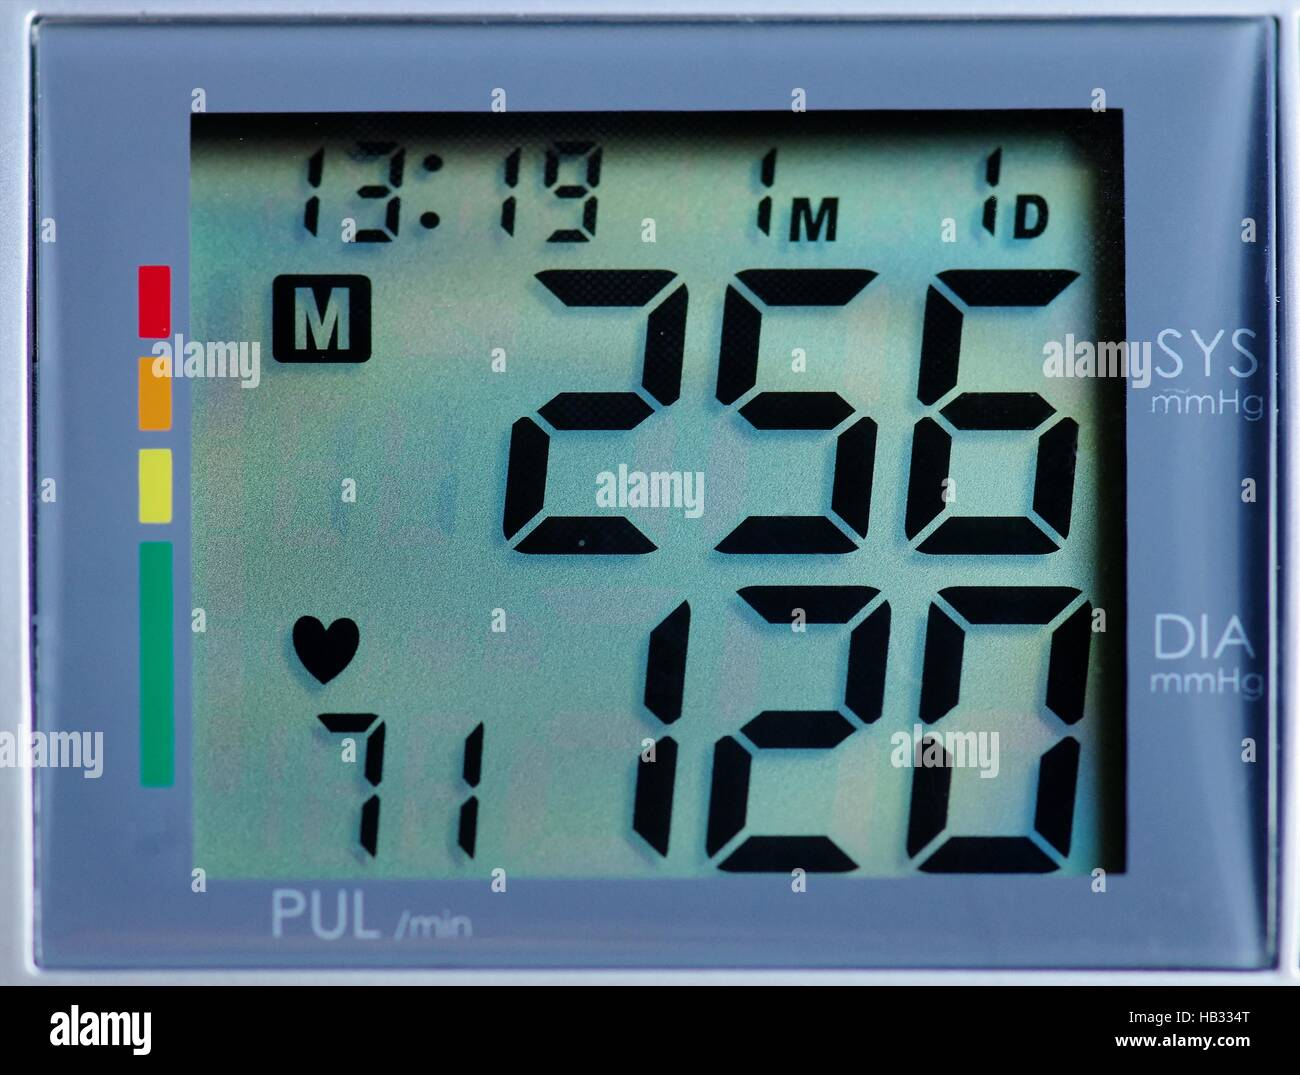 blood pressure meter - Stock Image